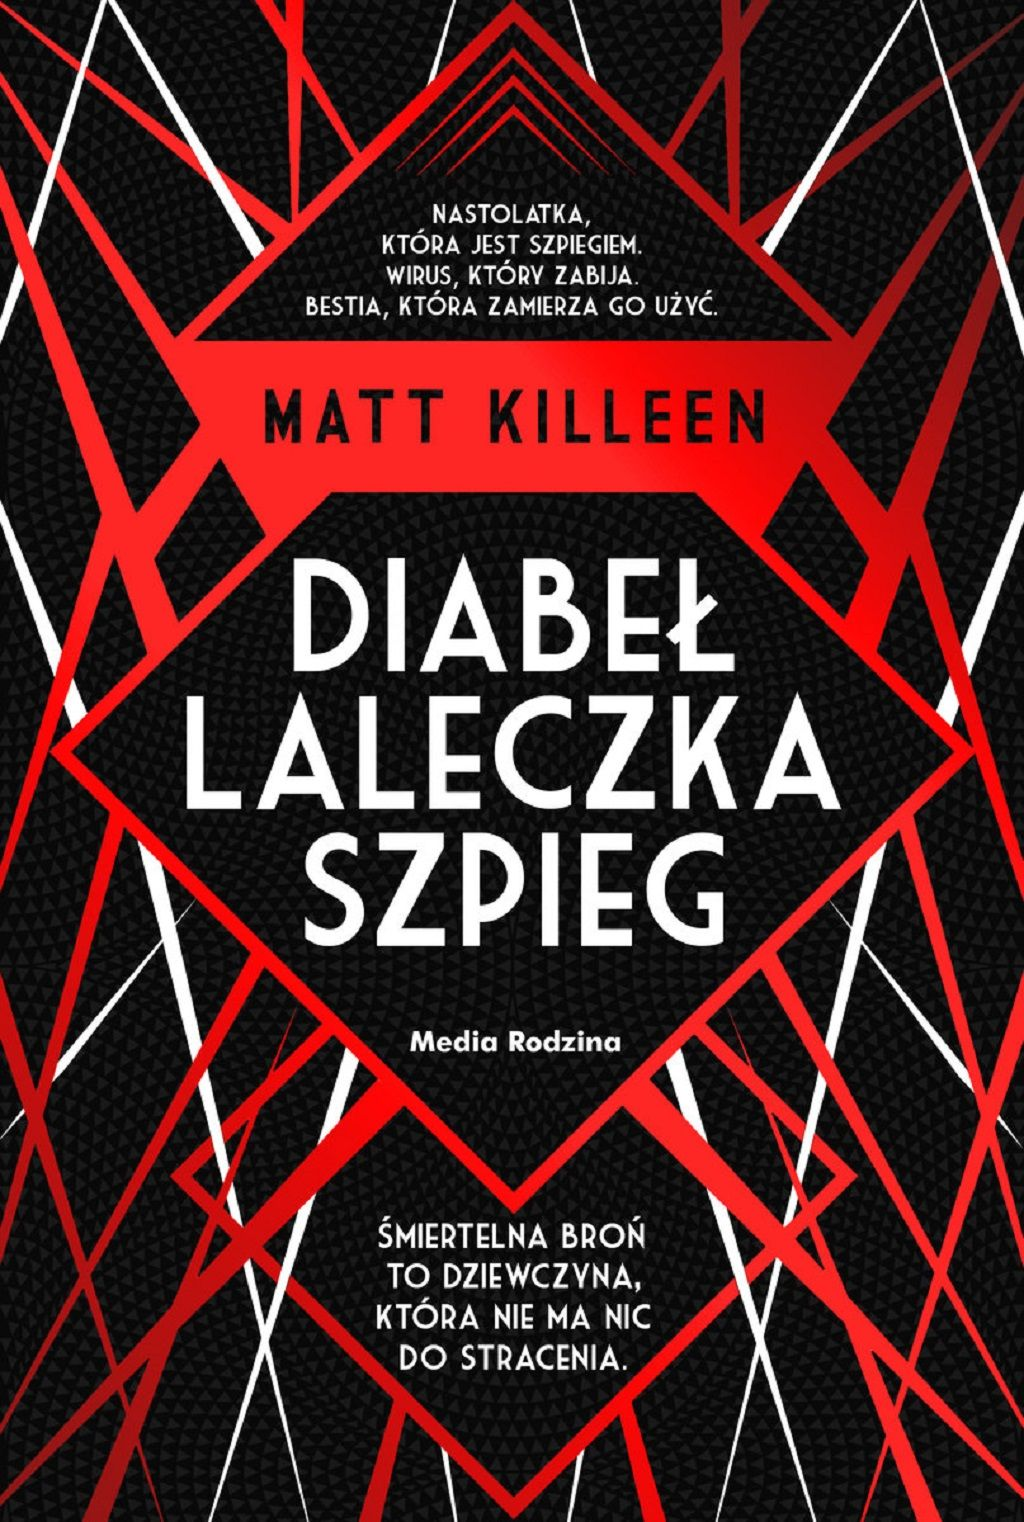 Matt Killeen – Diabeł, laleczka, szpieg